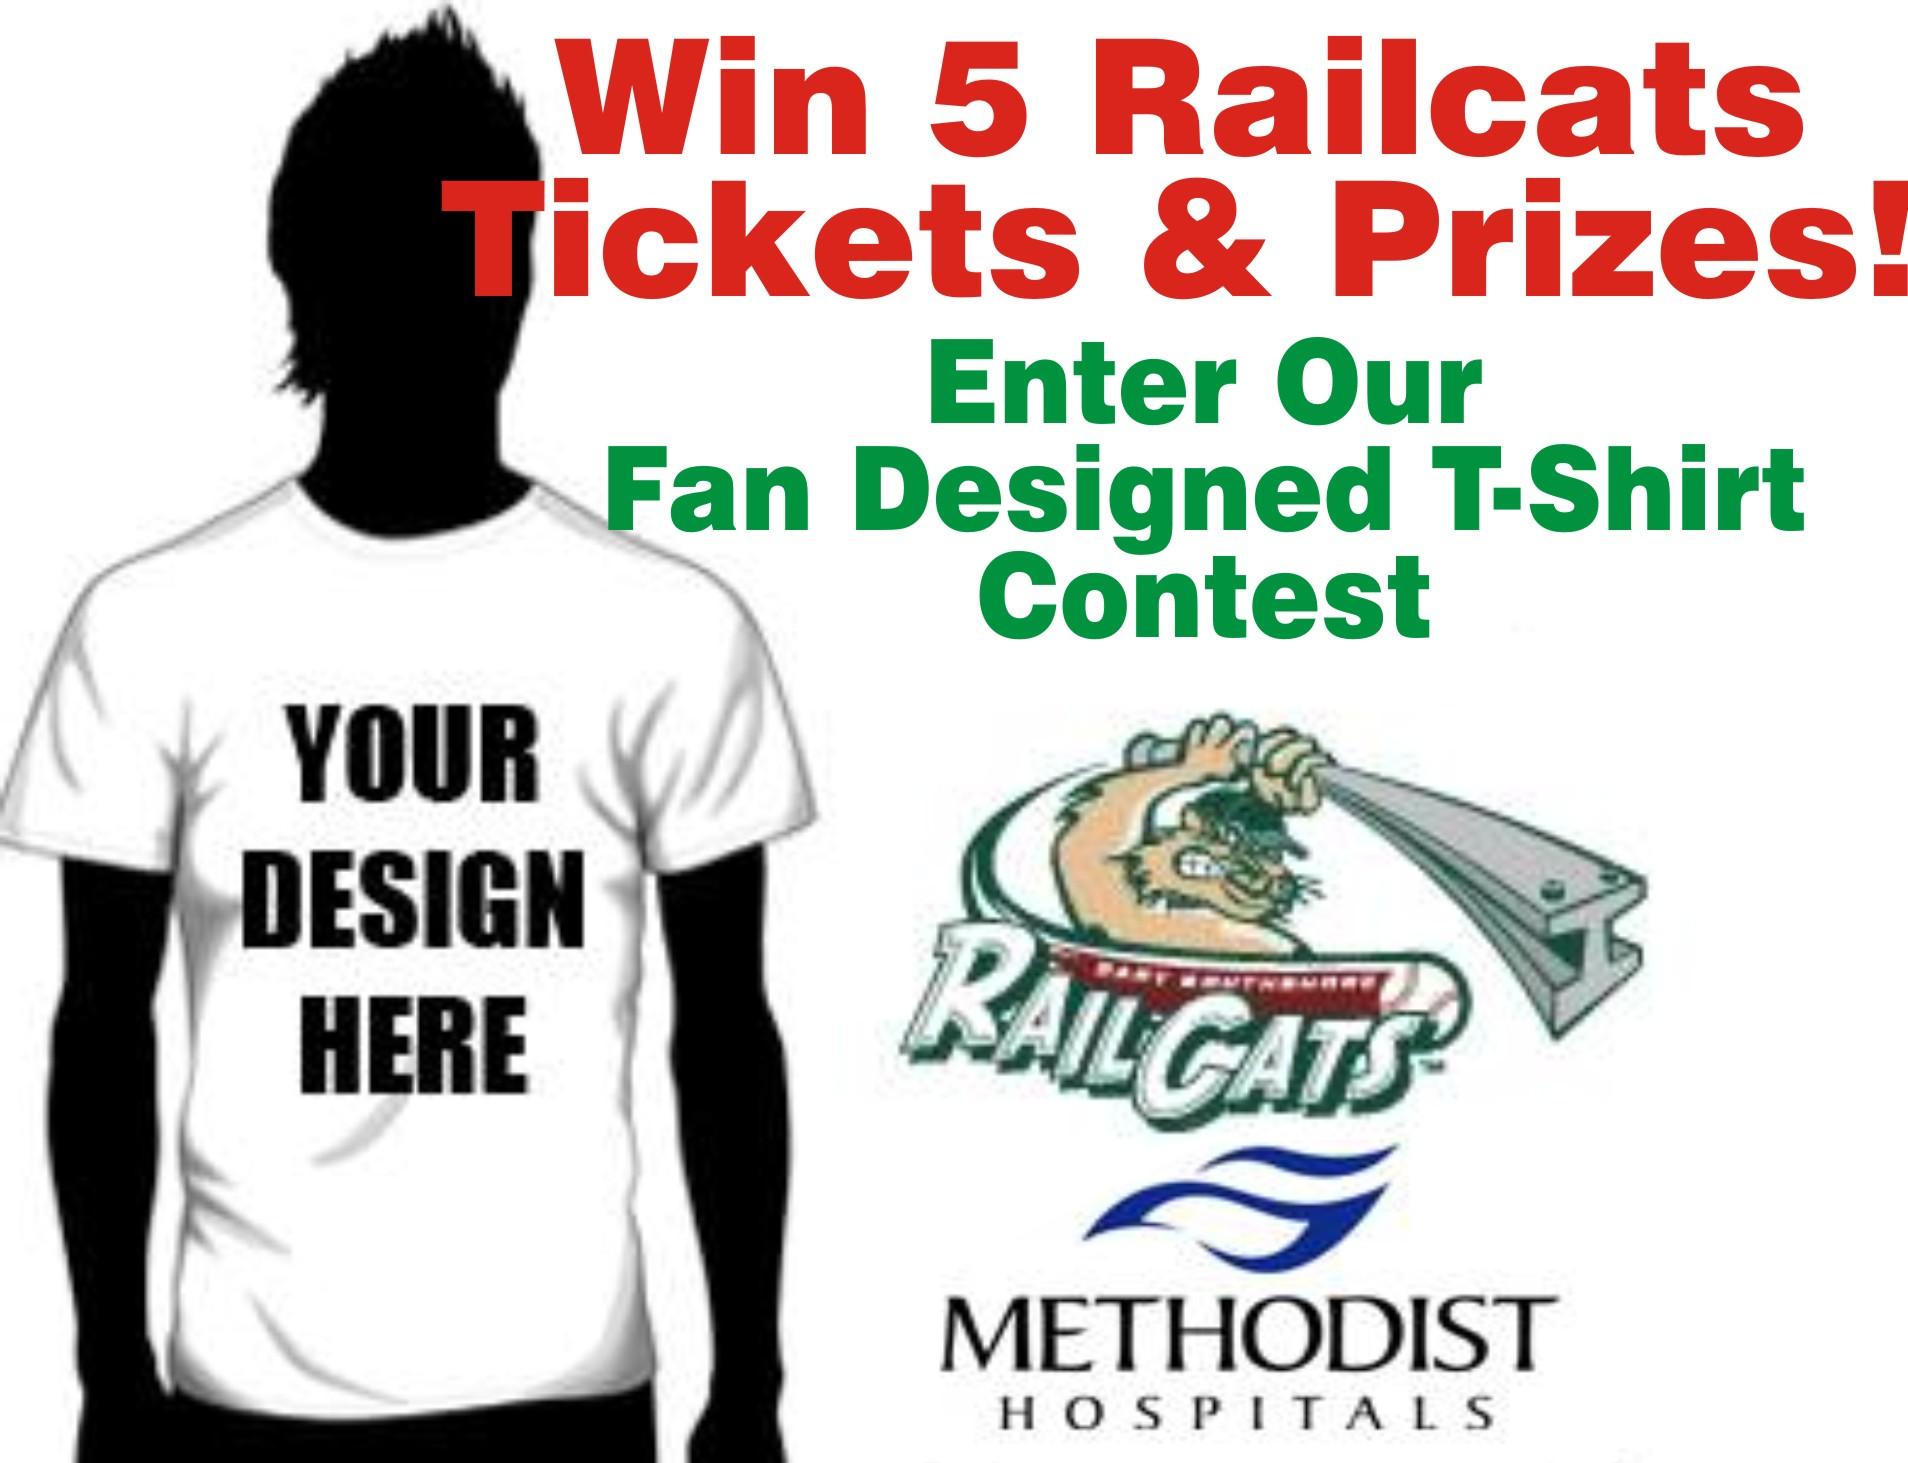 Methodist Hospitals Gary Railcats contest